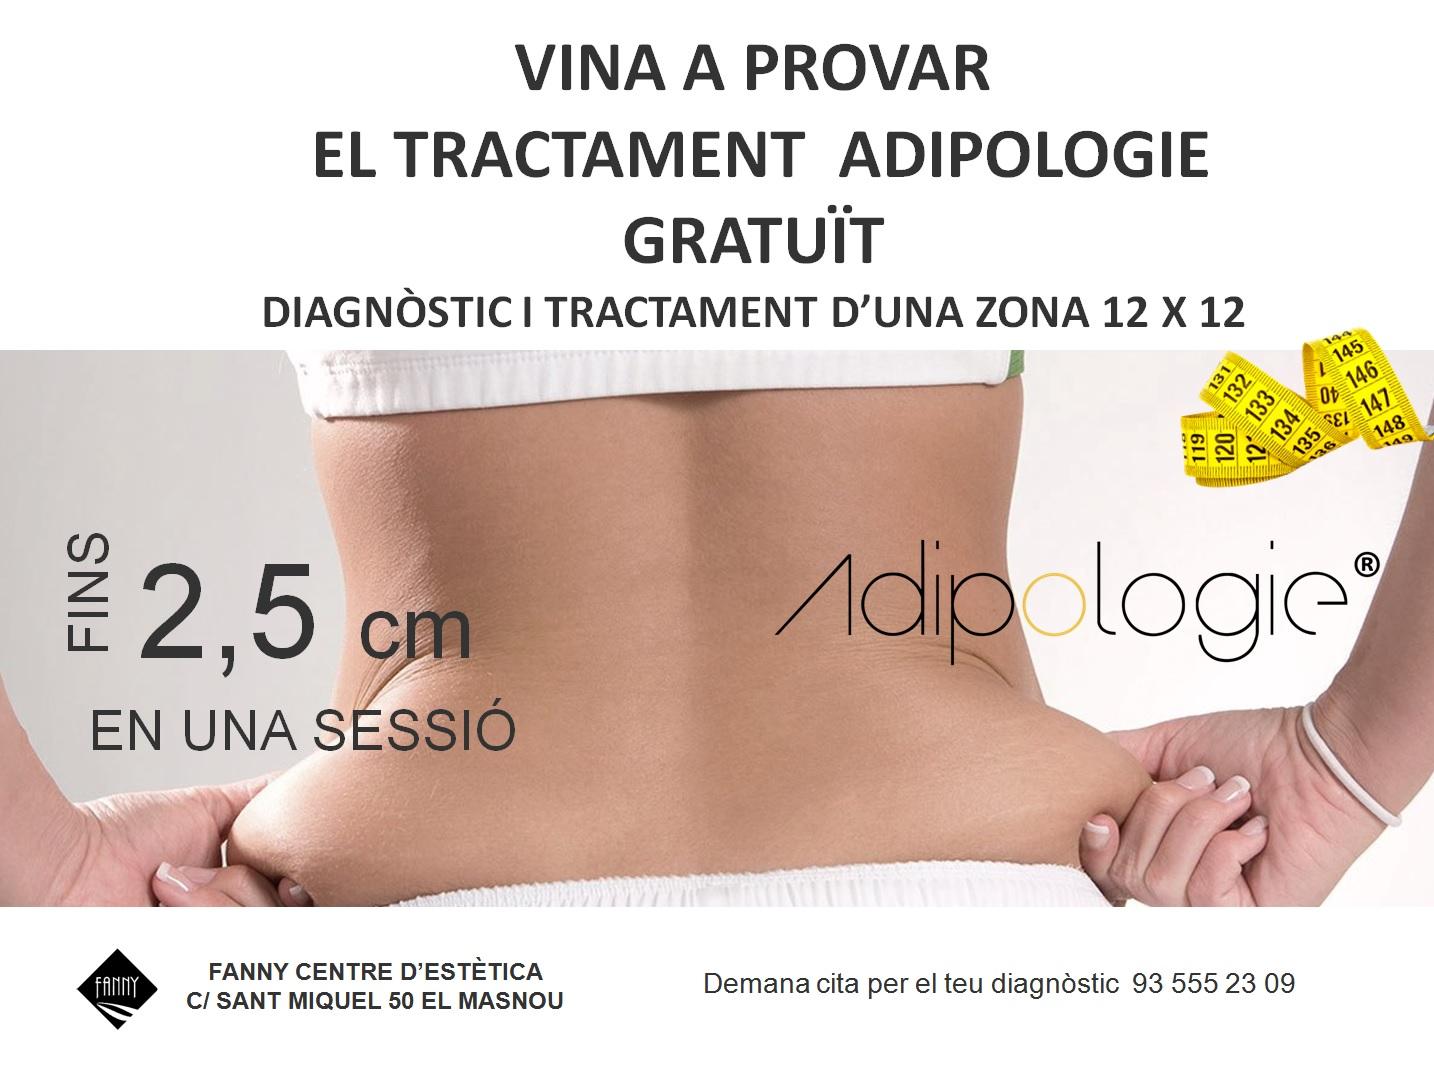 Fanny centre estetica el Masnou, alella, Teia, Adipologie, Celulitis, tractament cos